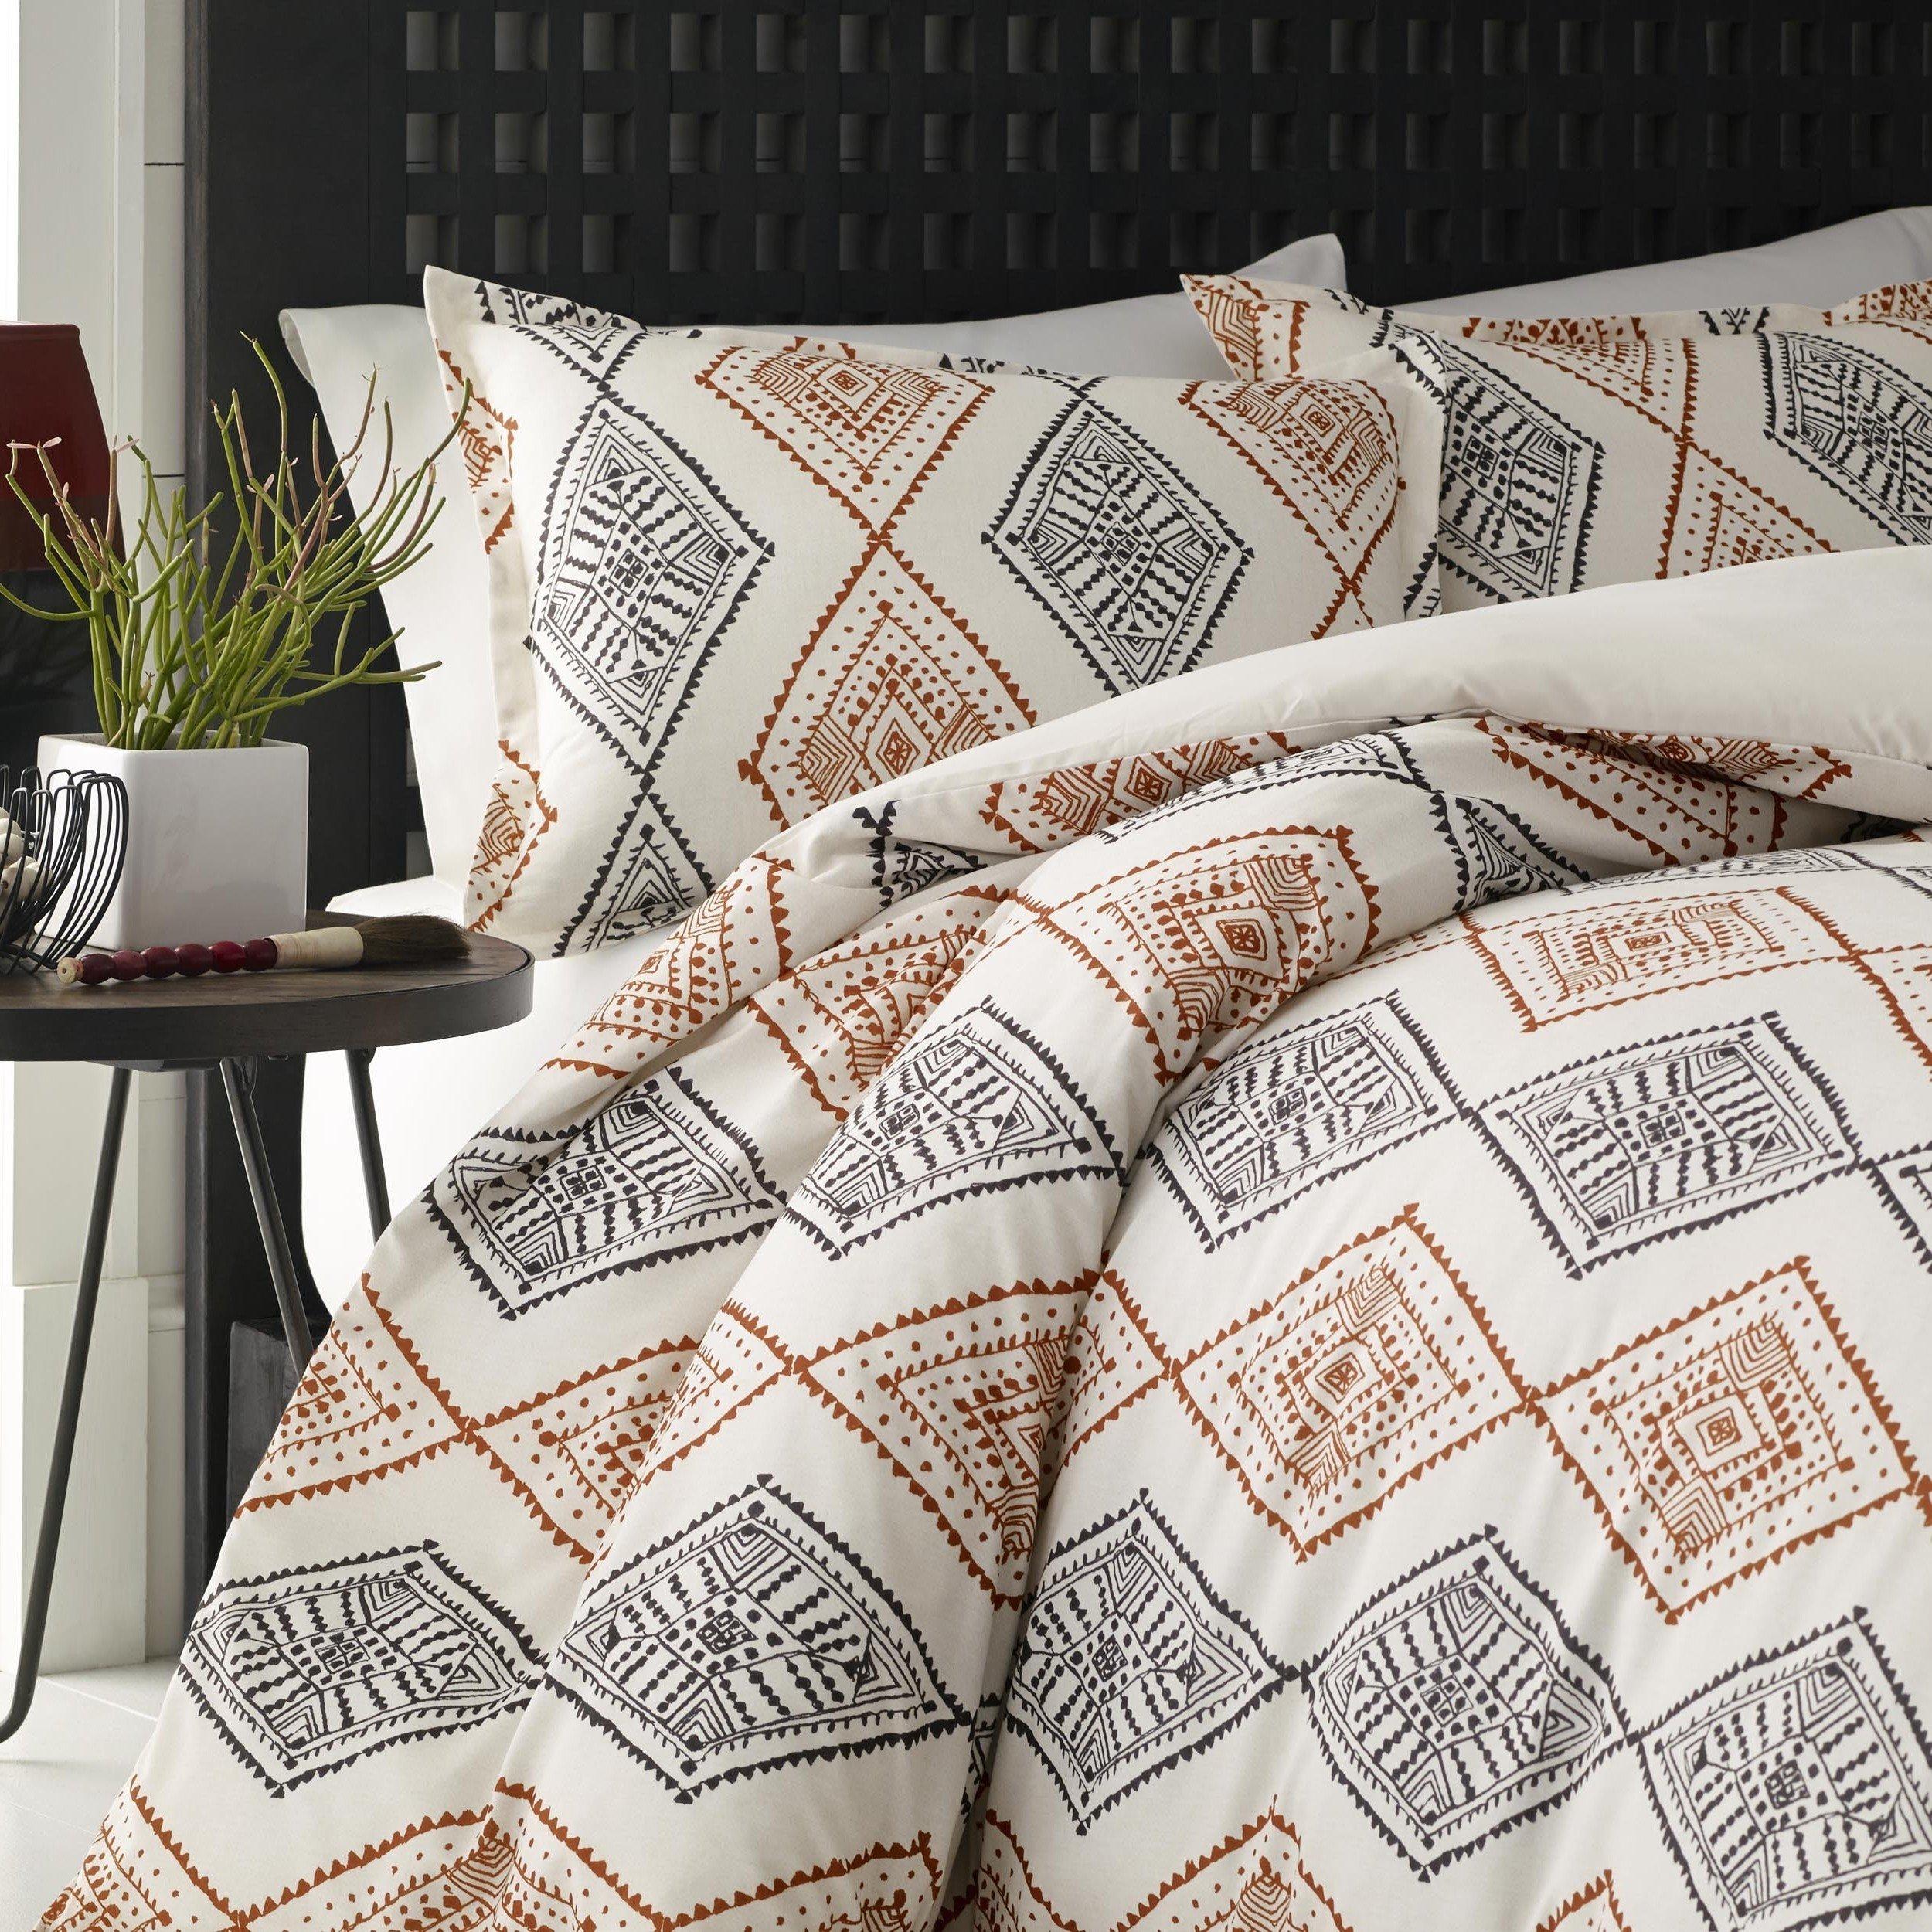 d81d781f3430 Get Quotations · 5 Piece Burnt Orange Grey Off White Aztec Southwest Theme  Comforter Full Queen Set